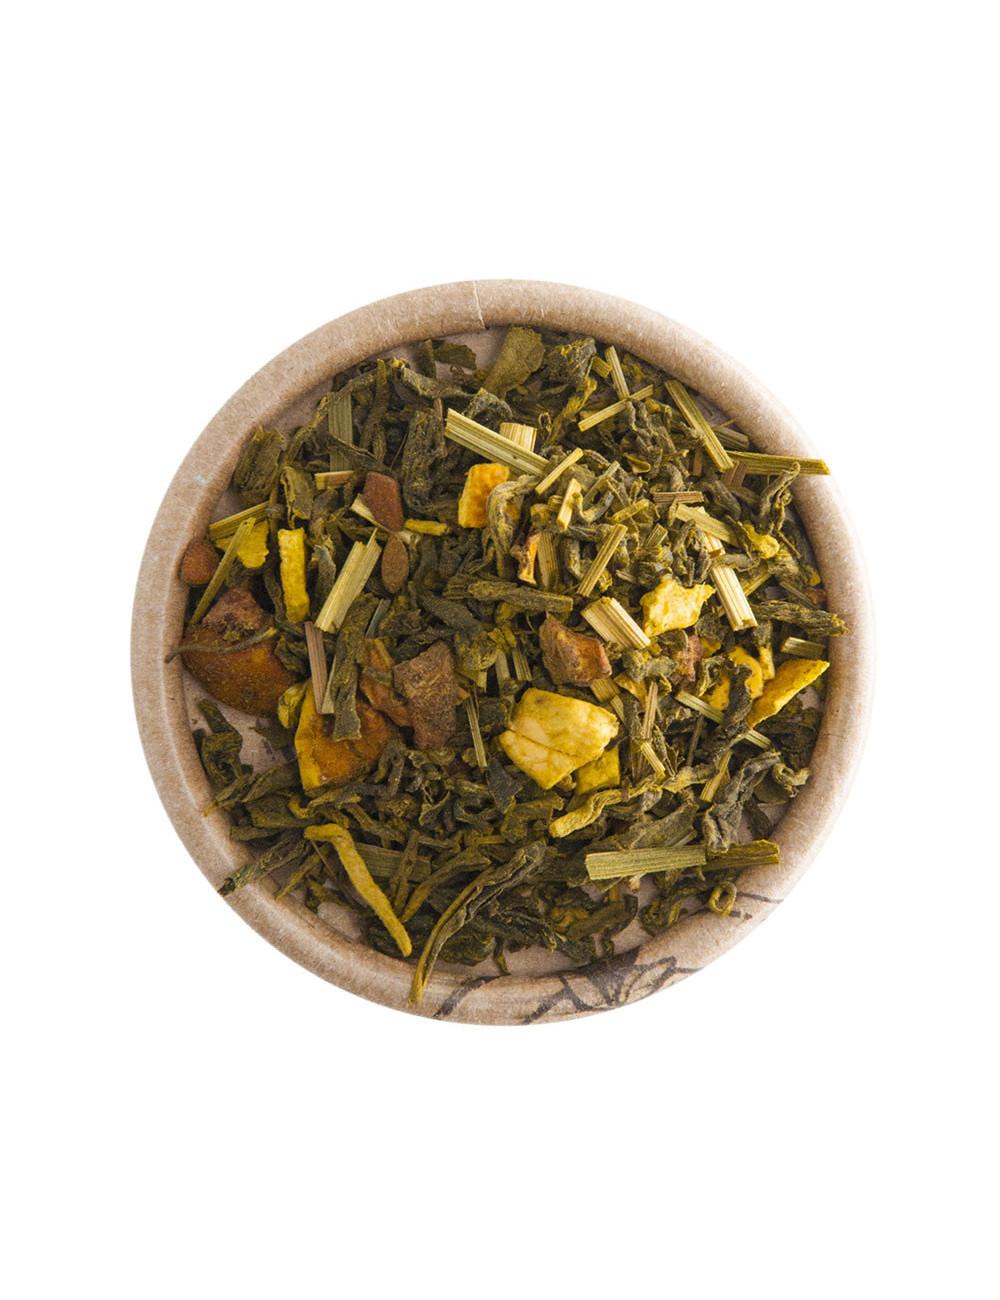 Japan Matcha al Limone tè verde aromatizzato - La Pianta del Tè shop online